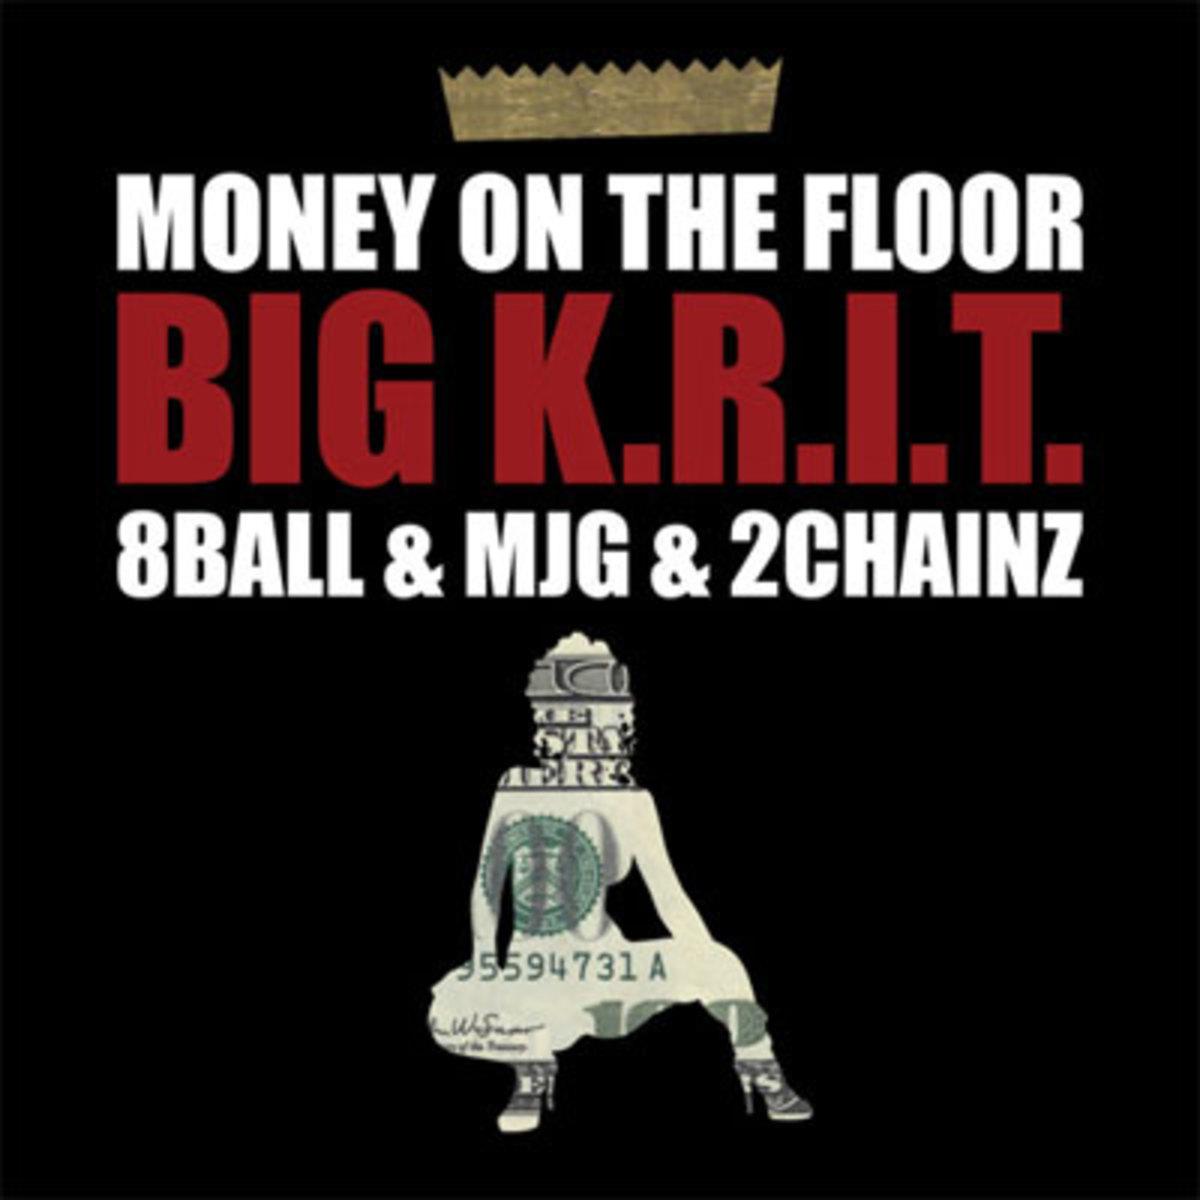 bigkrit-moneyonthefloor.jpg